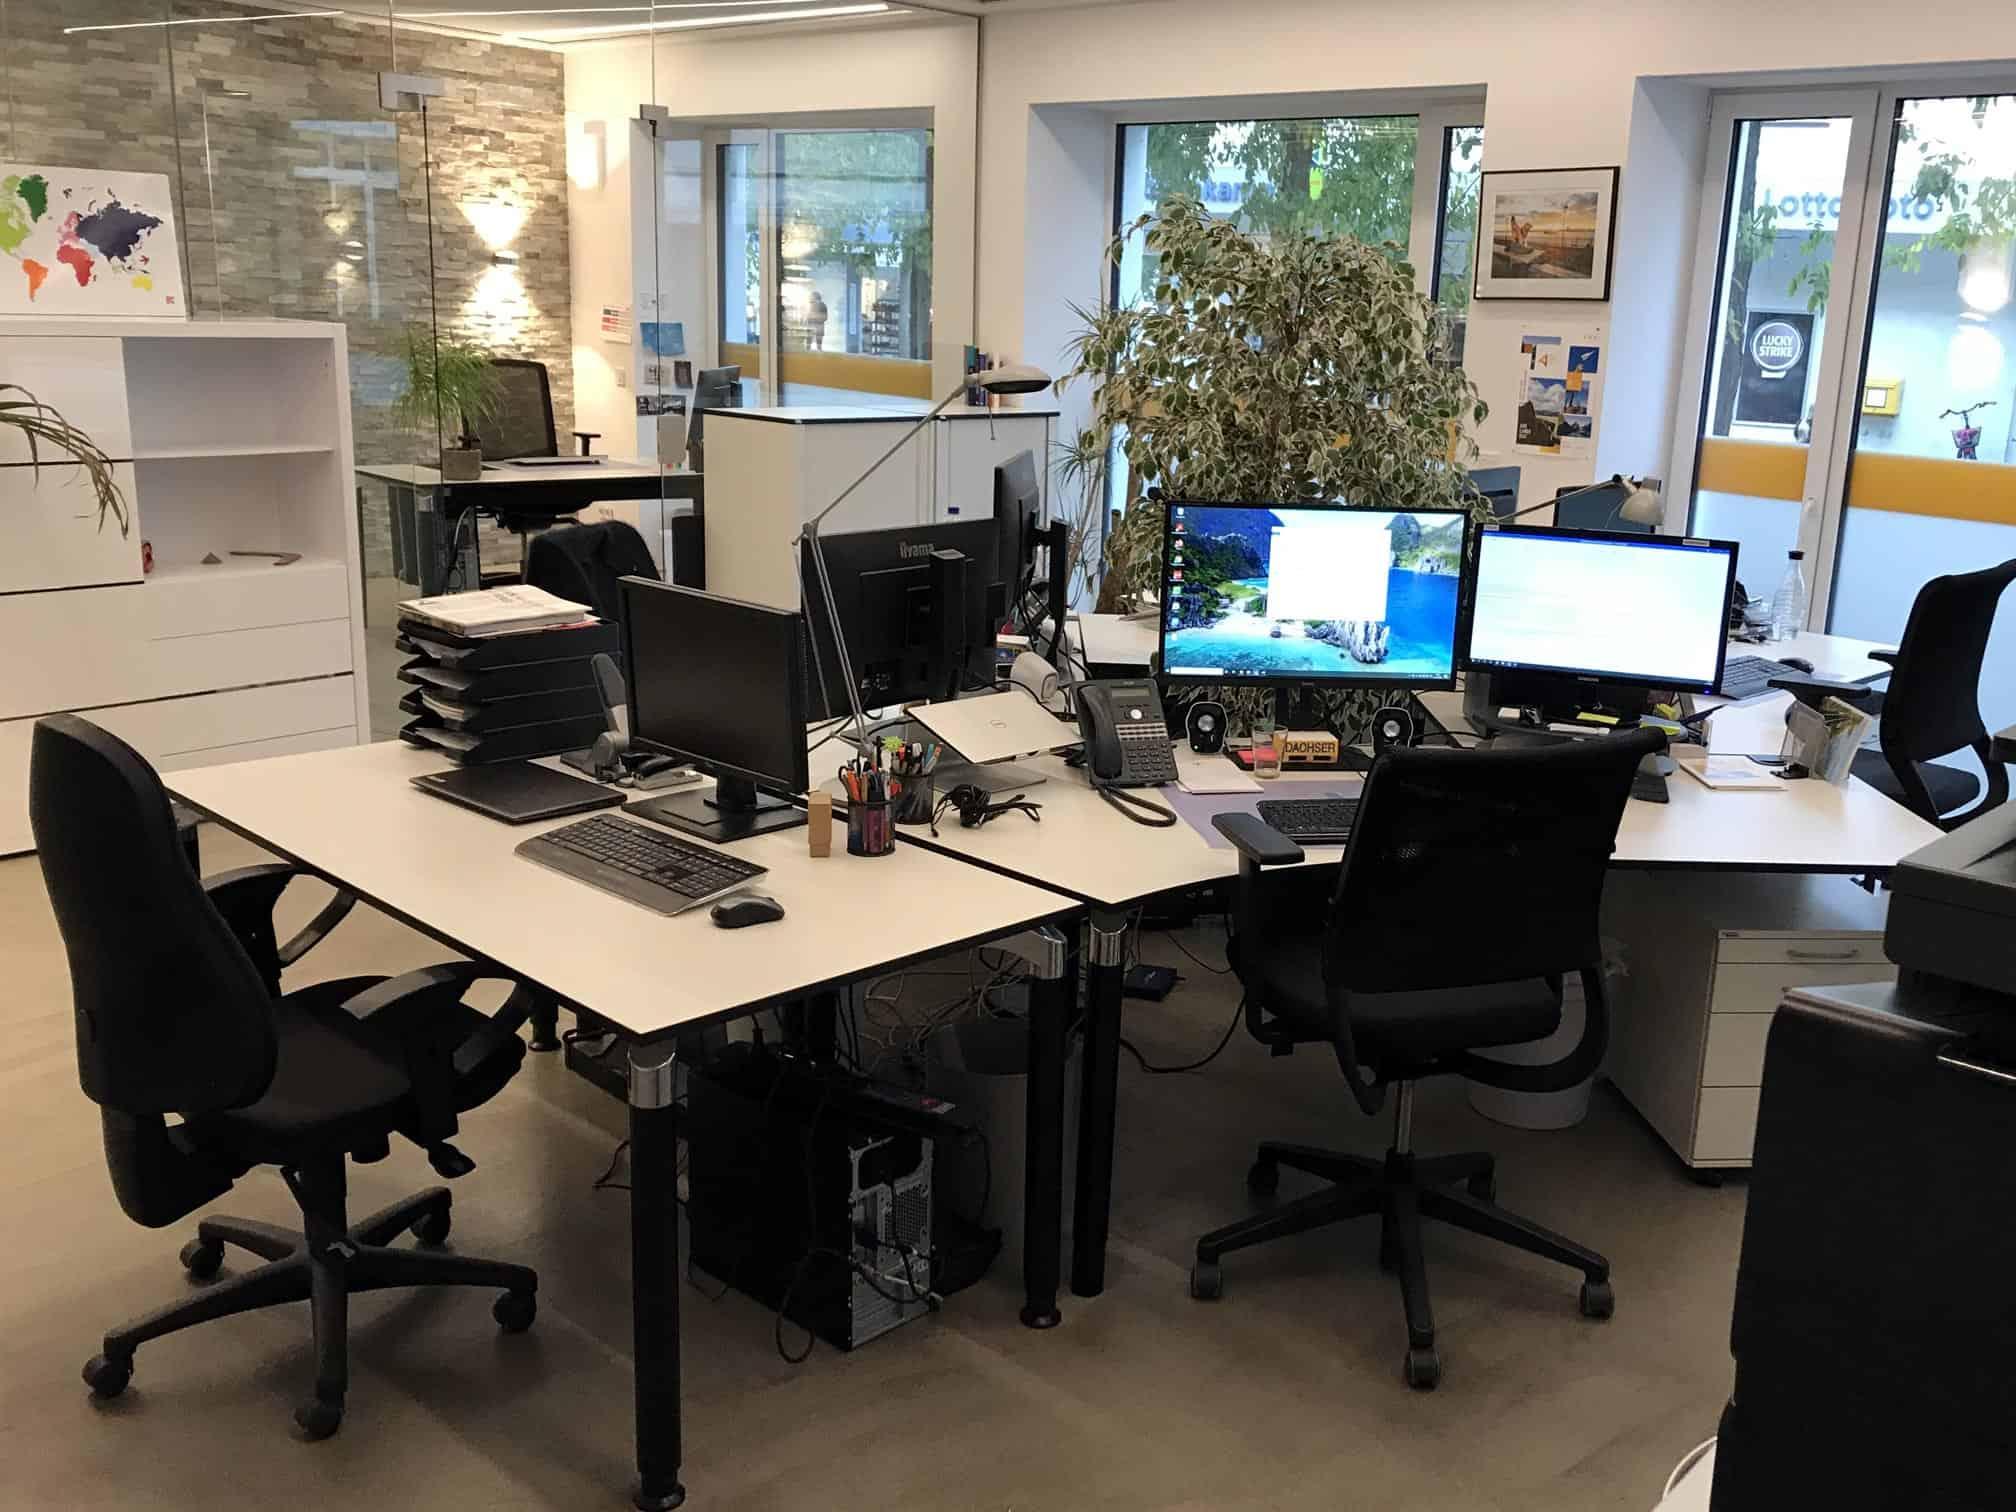 coworking rheda grossraumbuero - CoWorking & Gemeinschaftsbüros in Rheda